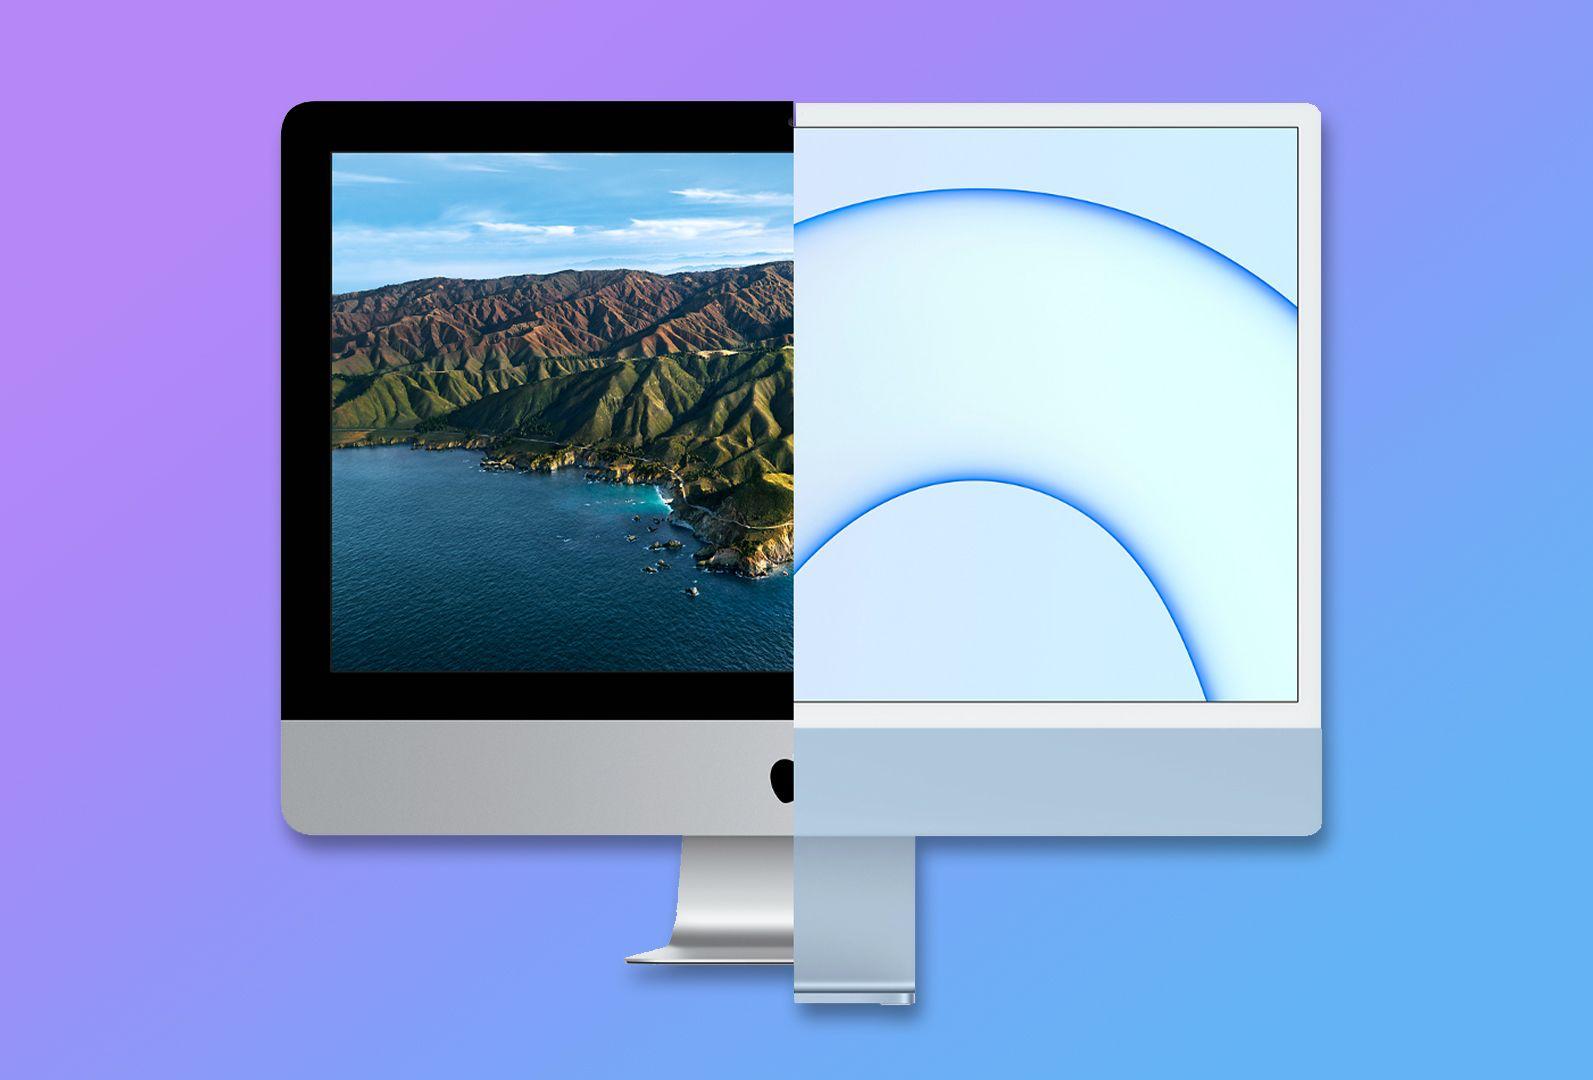 iMac Intel vs iMac M1